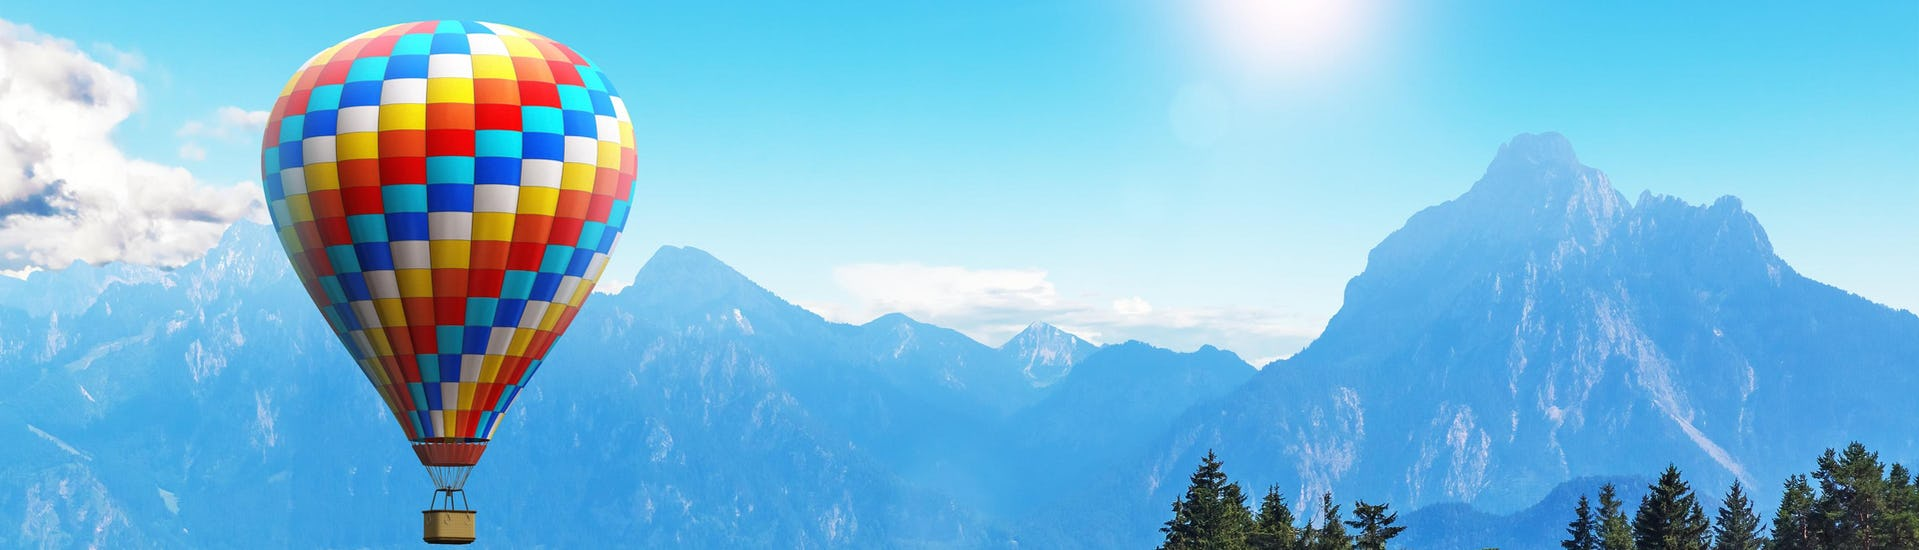 A hot air balloon ride over the ballooning hotspot of Bavaria.